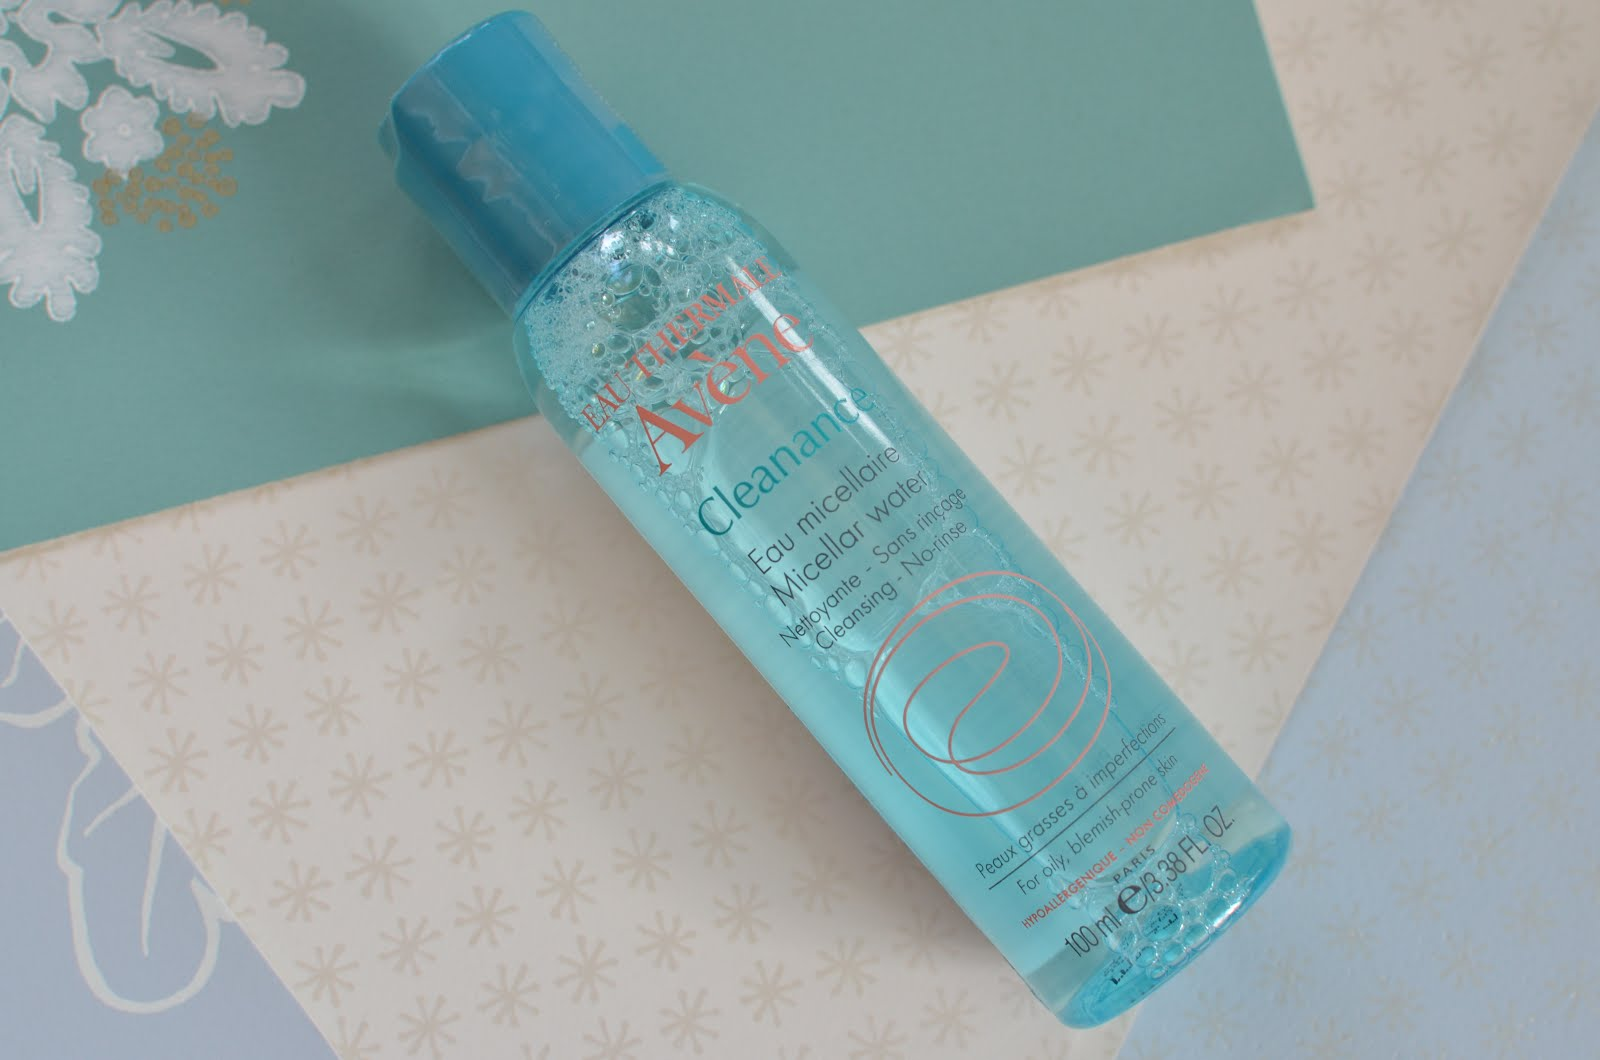 Avene Eau Thermale Cleanance Micellar Water Мицеллярная вода для проблемной кожи